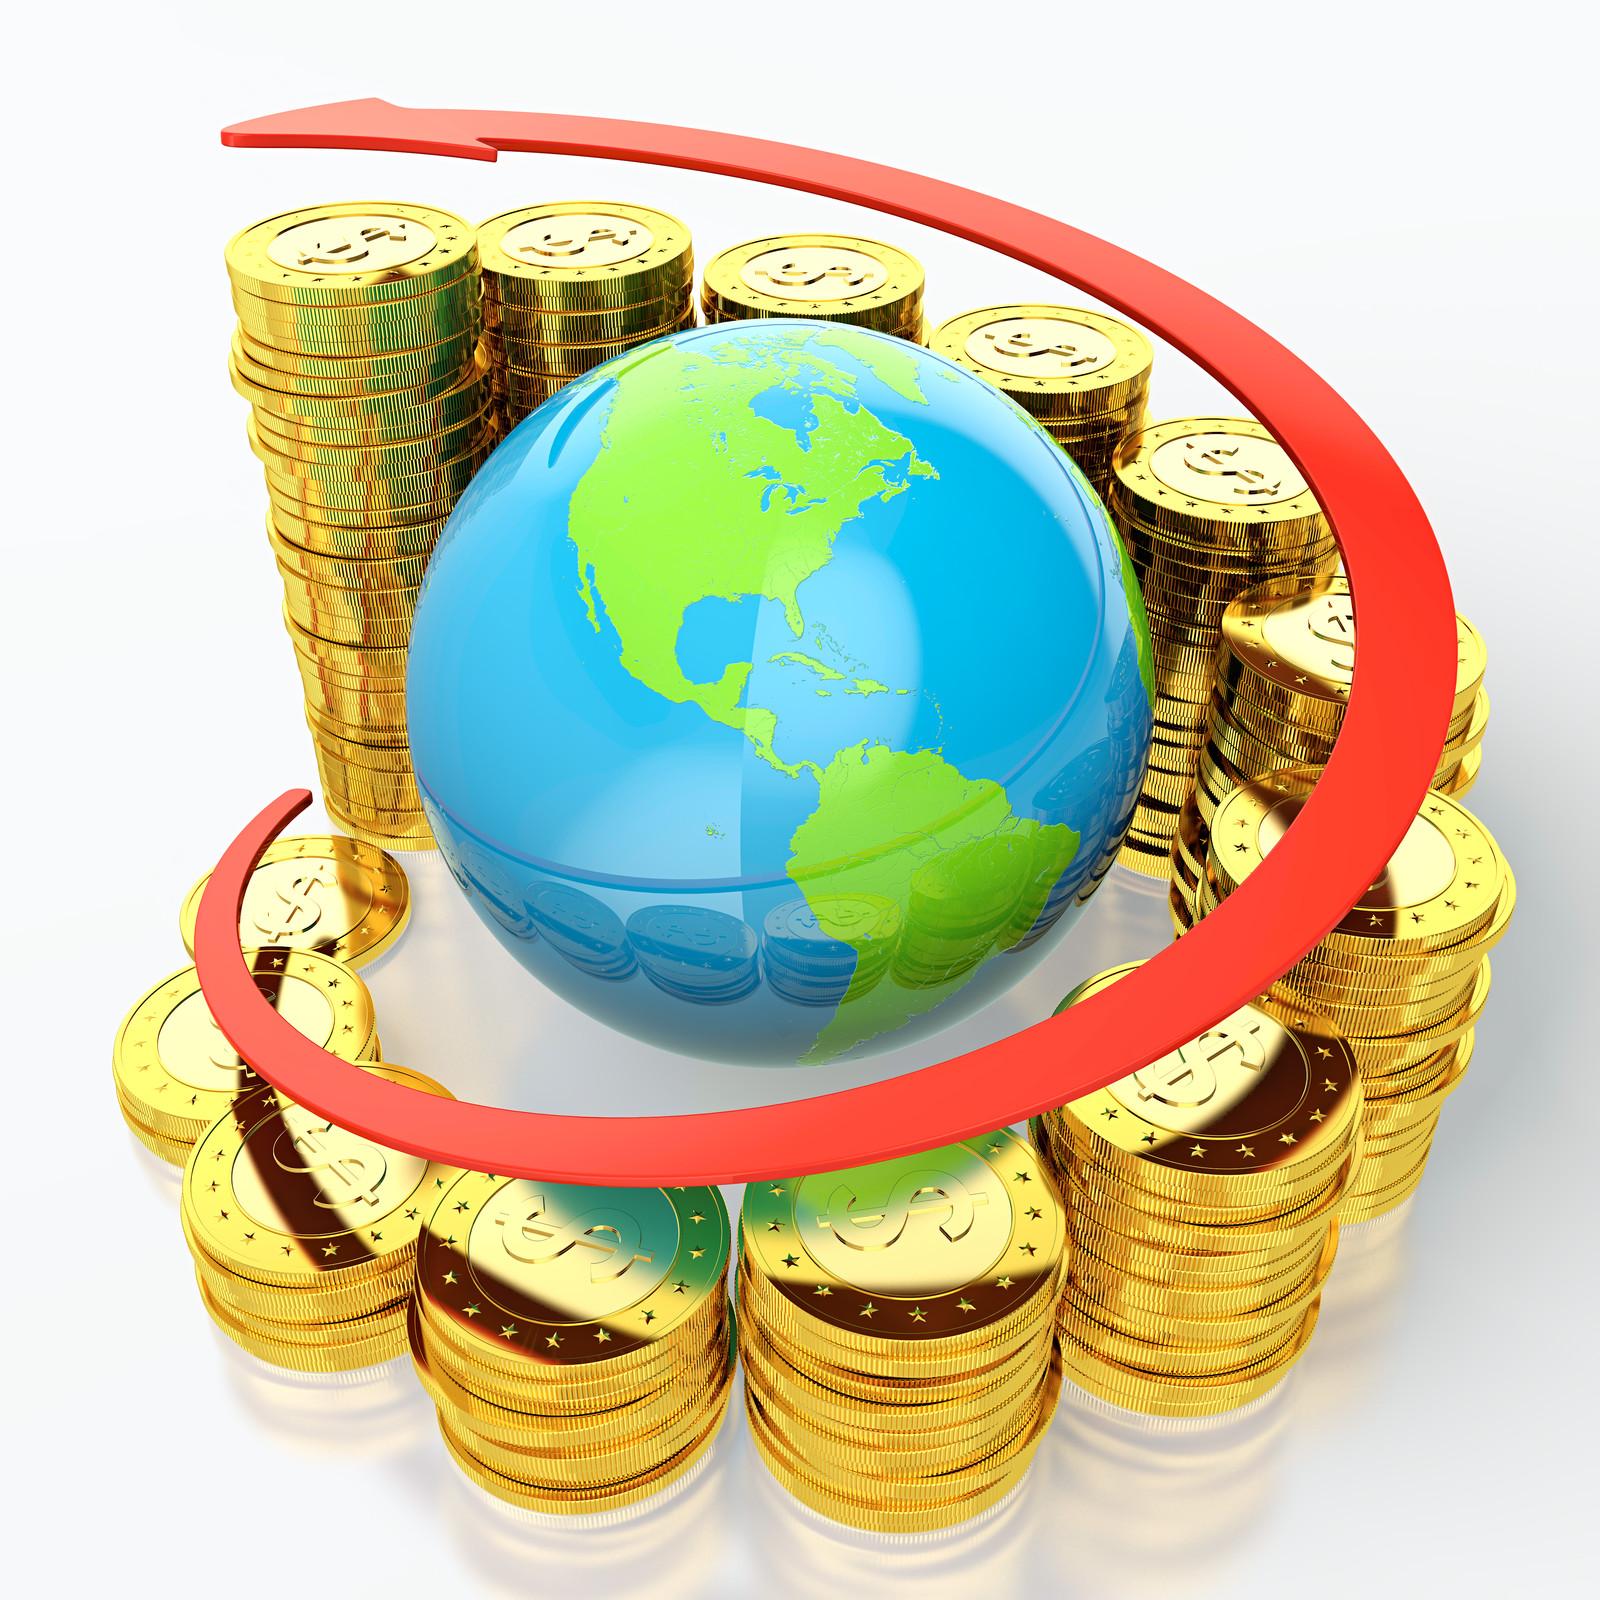 Rethinking 2021 Compensation Plans